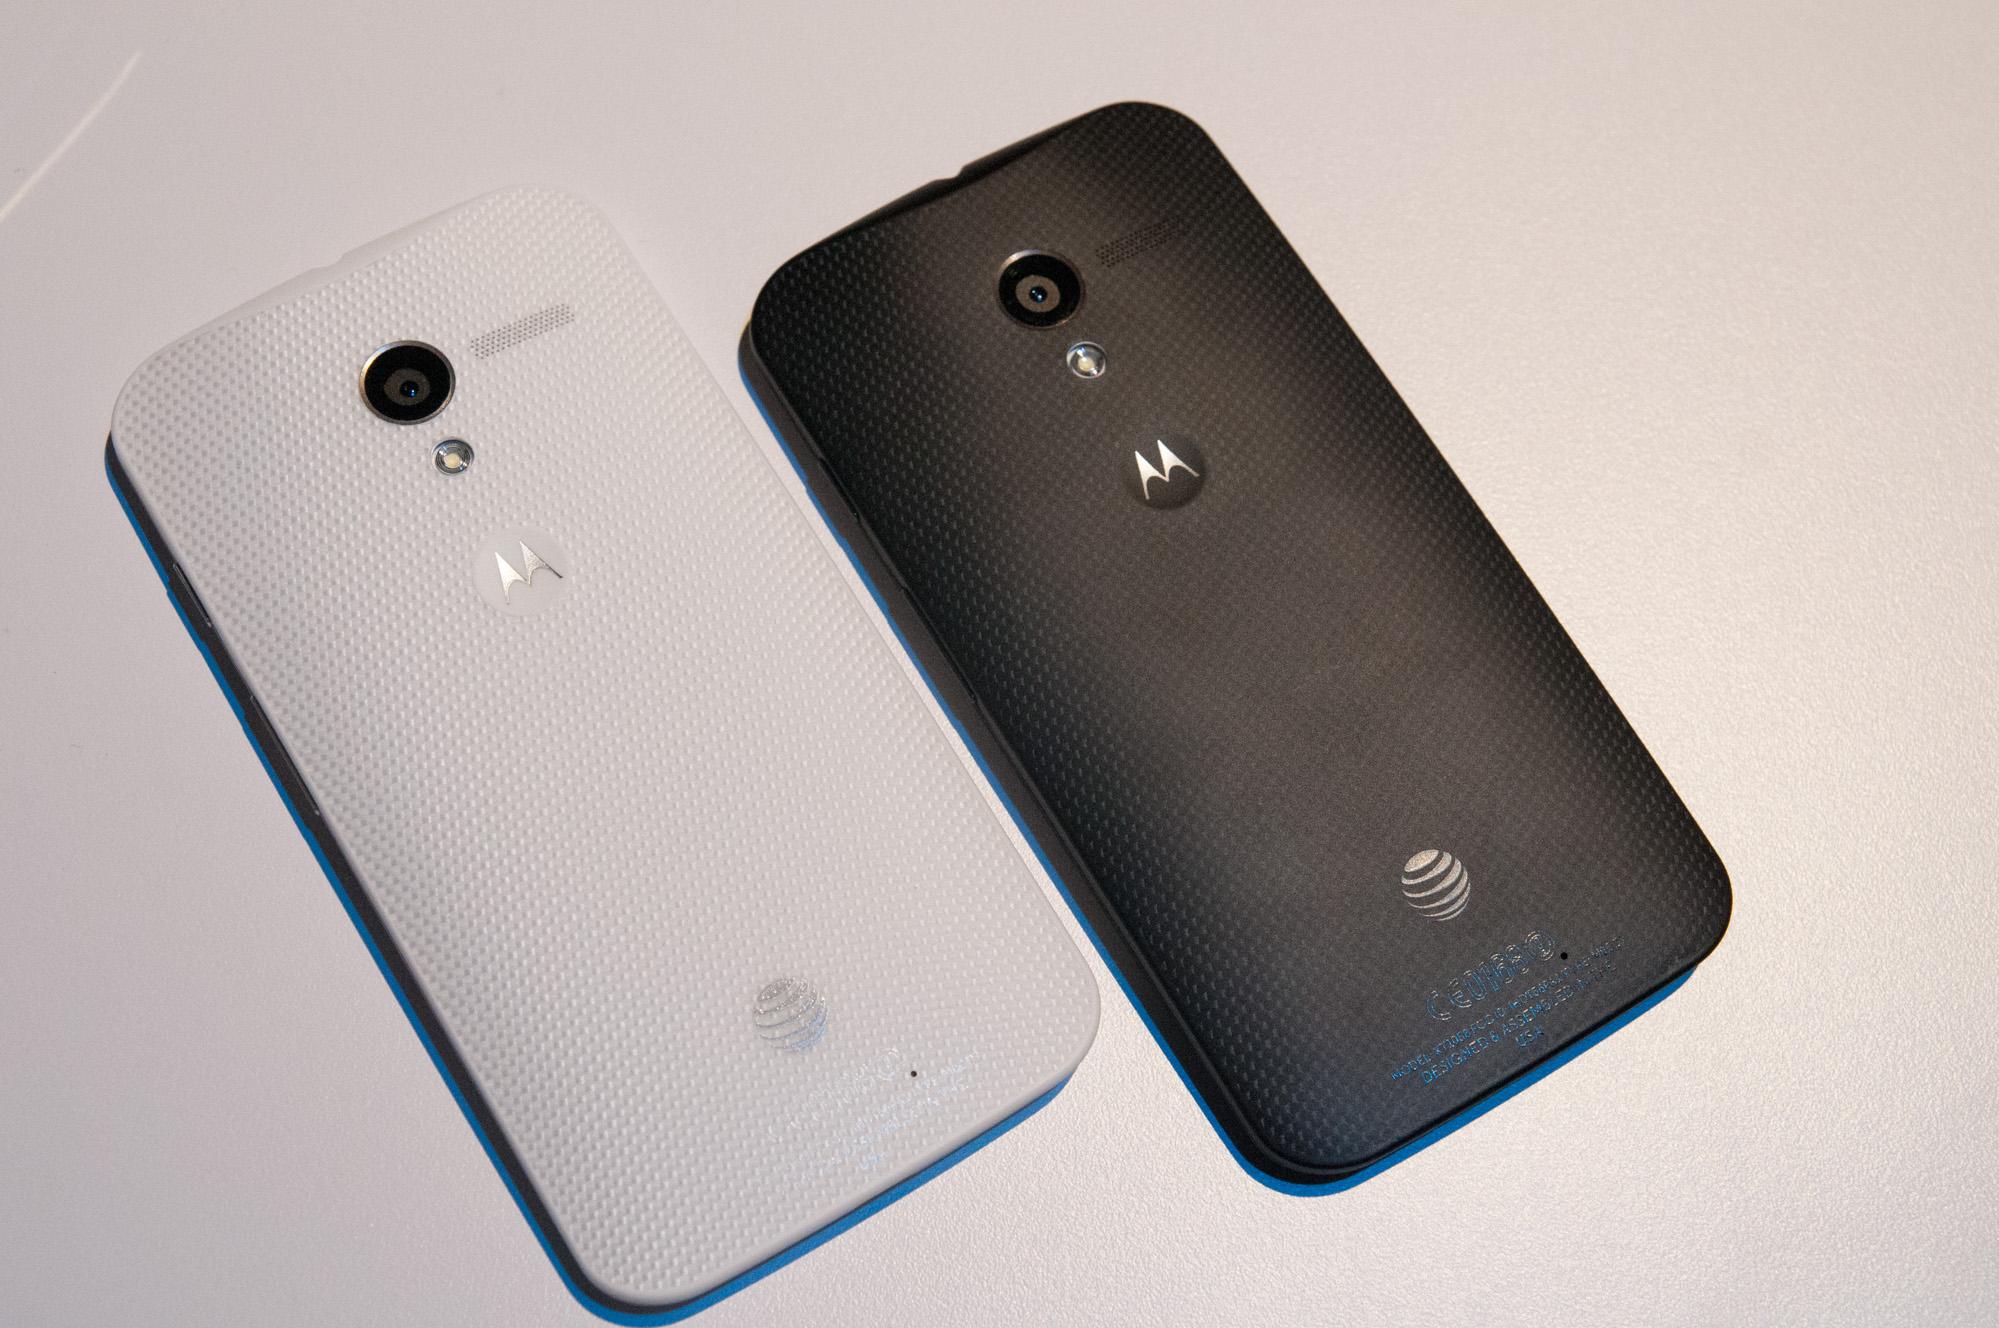 A Quick Look at the Moto X - Motorola's New Flagship